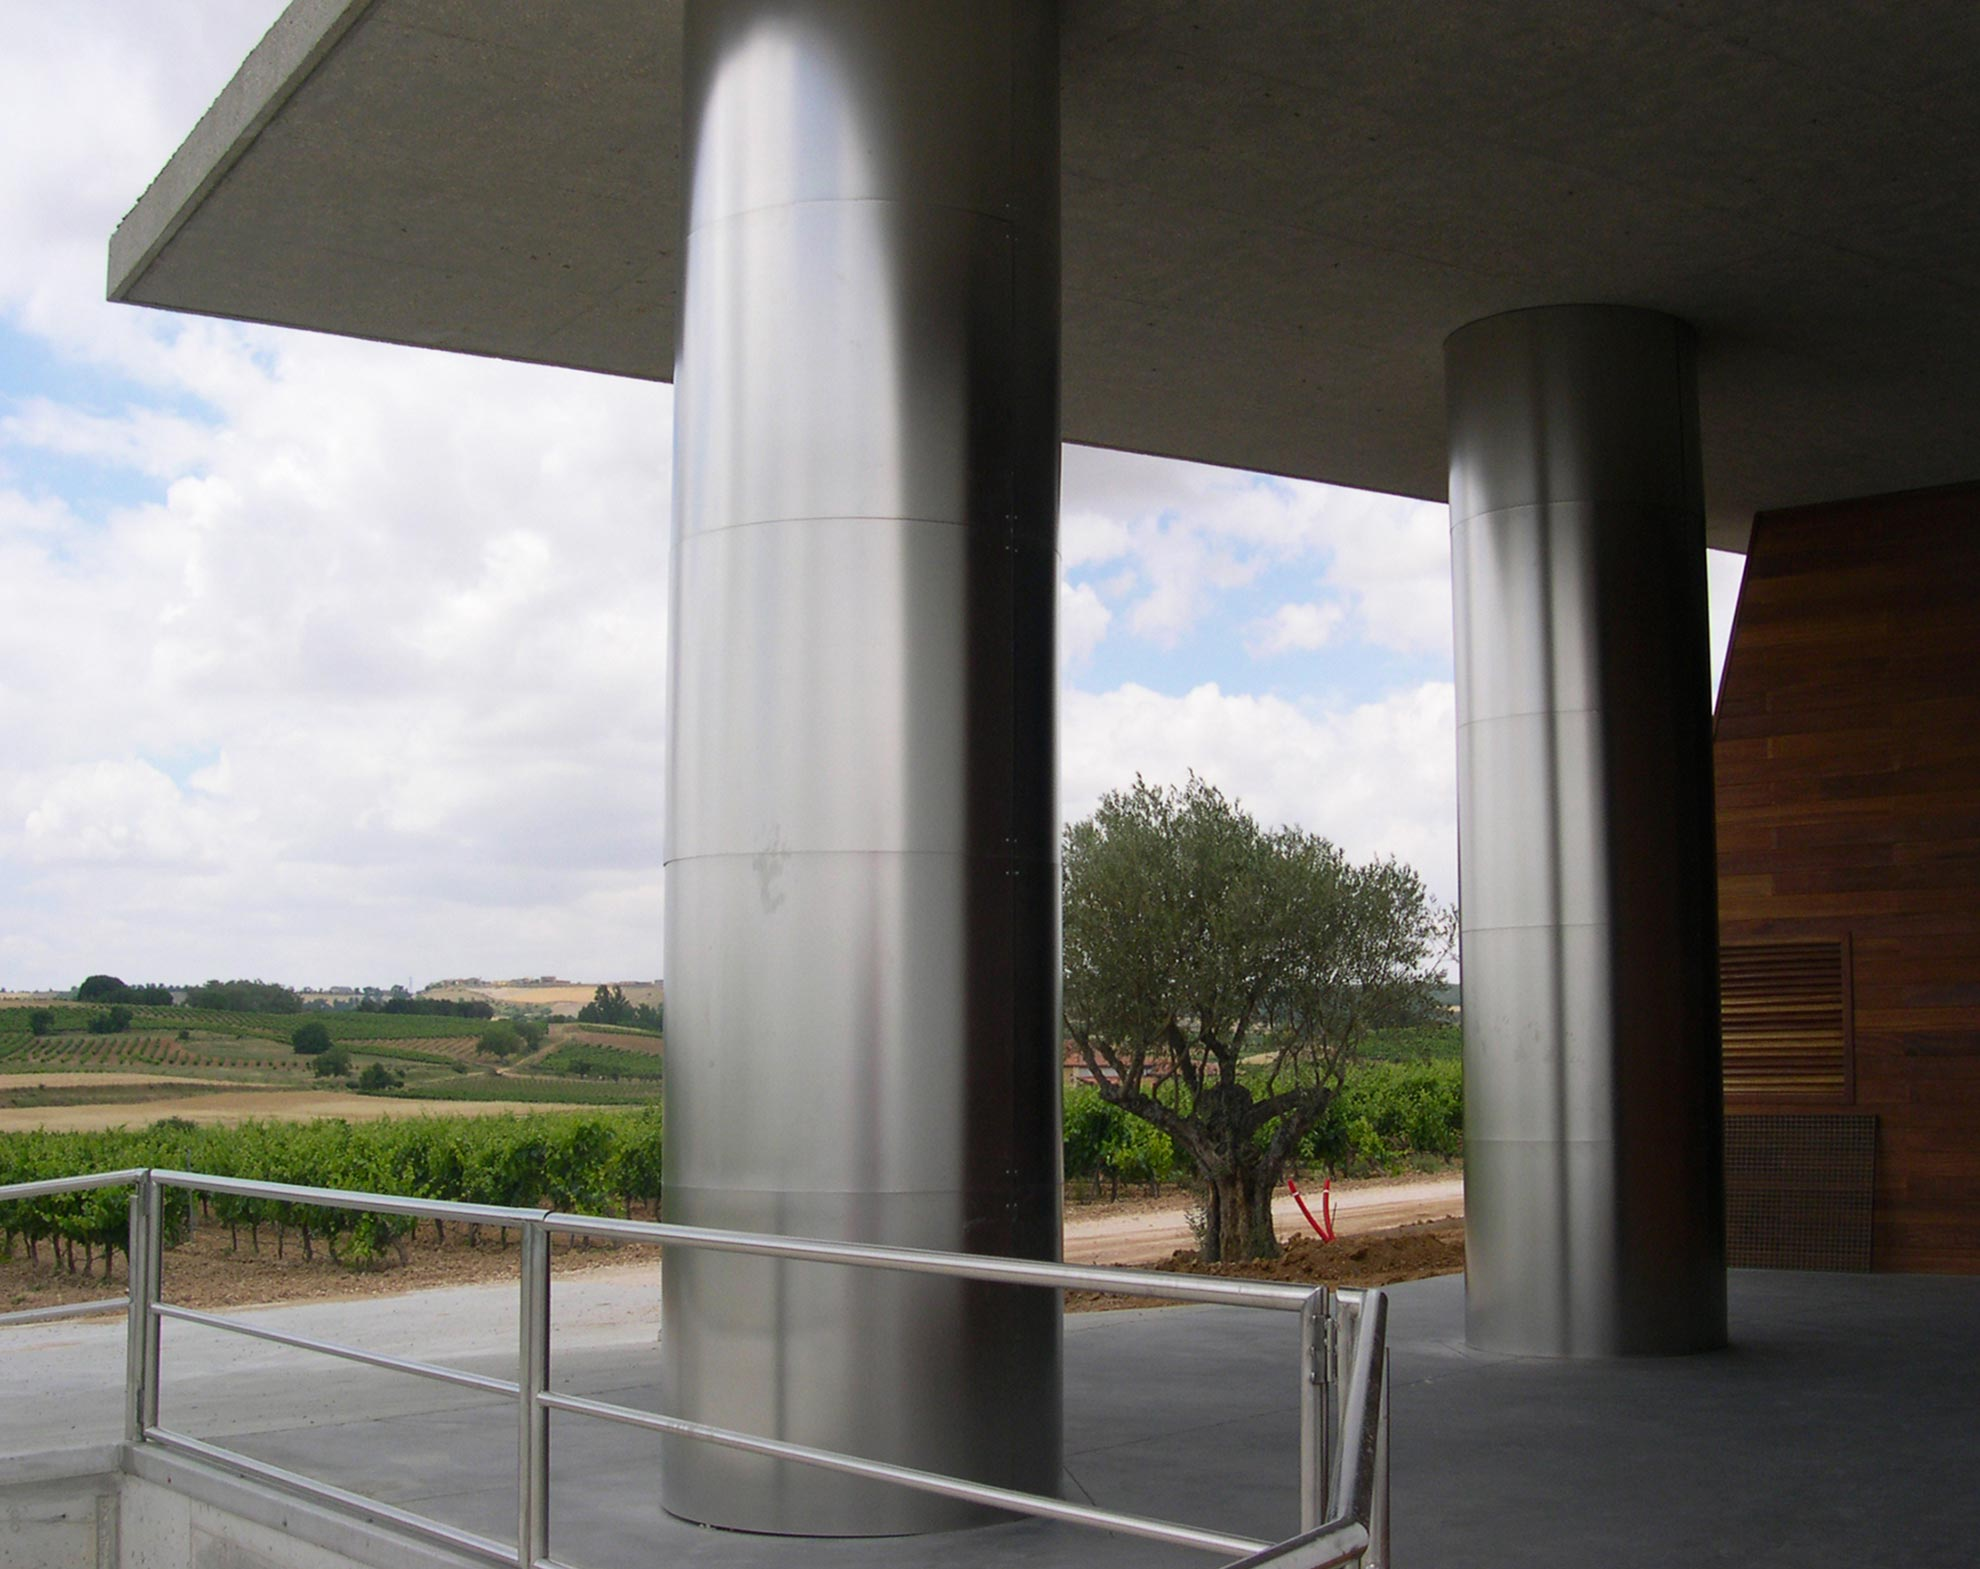 Bodega-Pago-Capellanes.-Pedros-de-Duero.-Burgos.-larson-1_1592311781.jpg